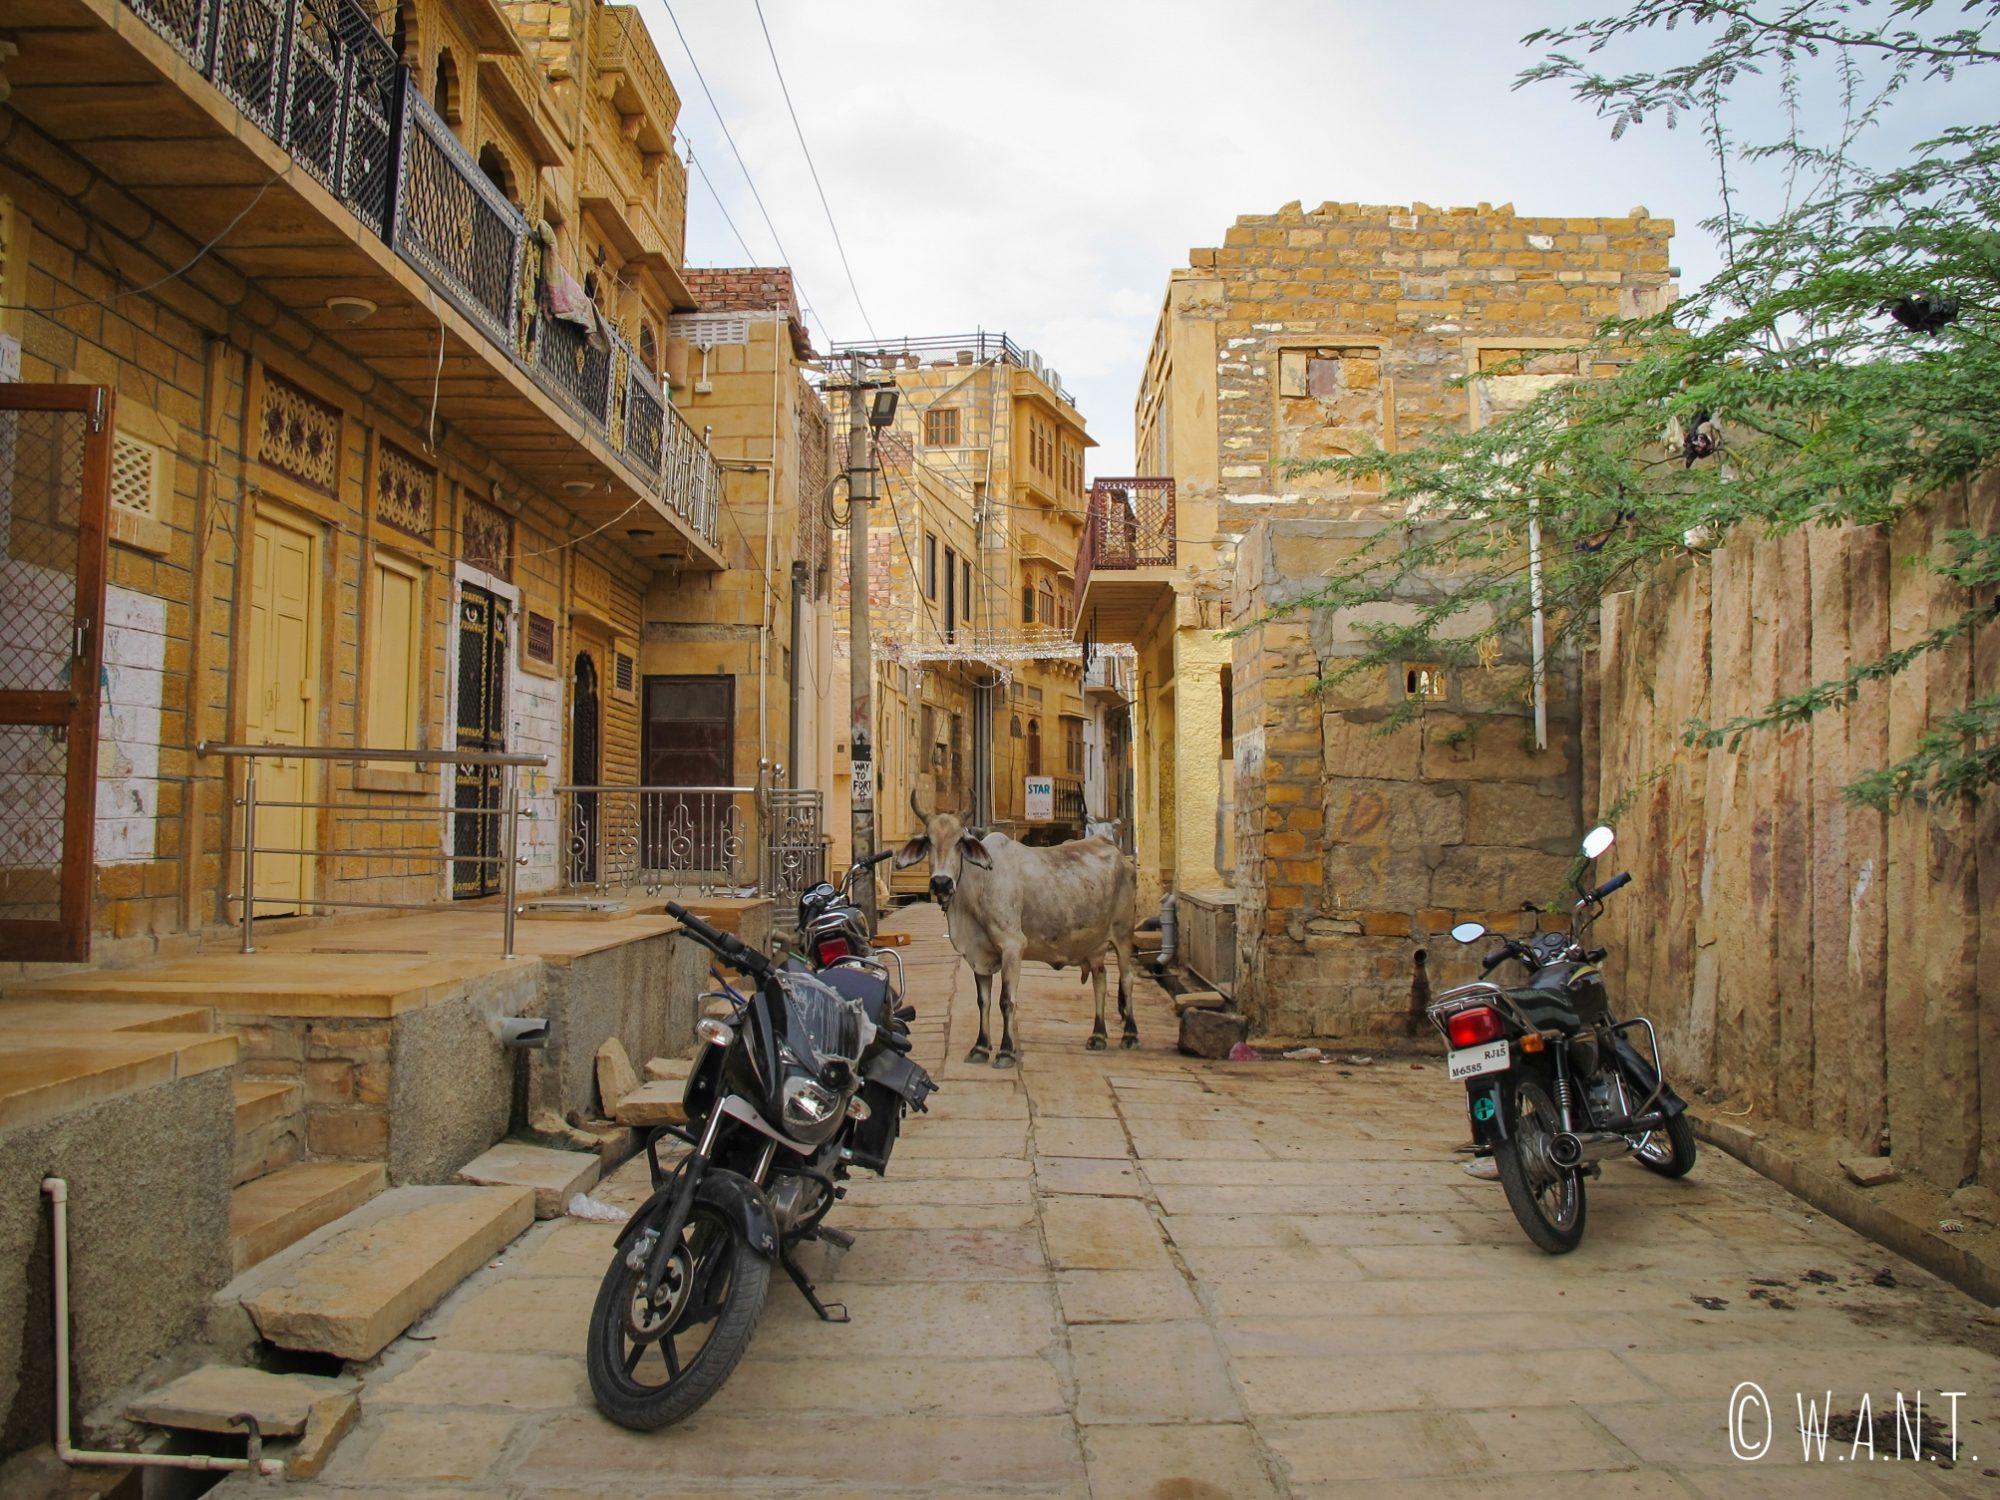 Rue typique hors de l'enceinte du fort de Jaisalmer